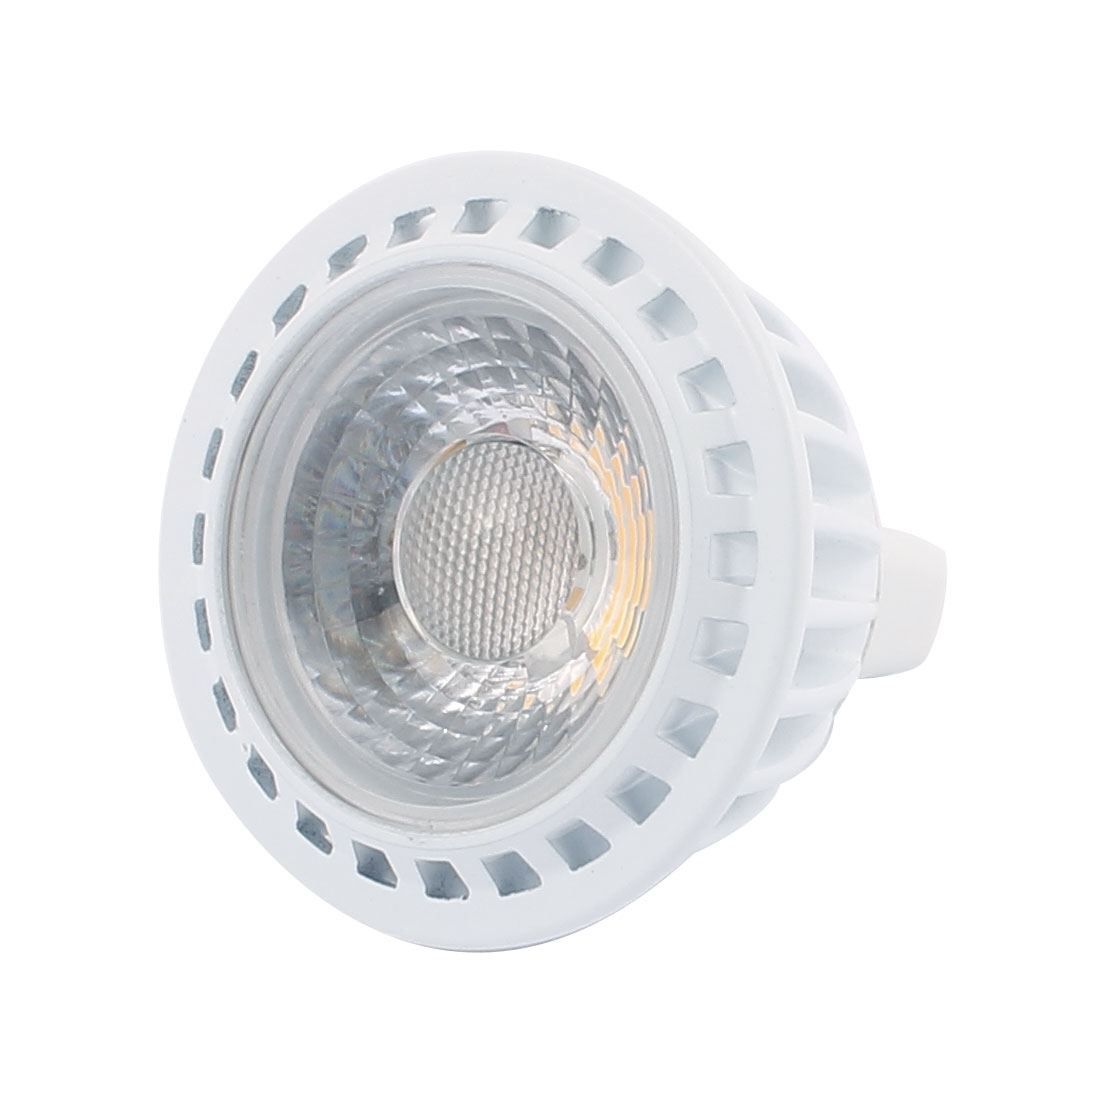 DC12V 5W MR16 COB LED Spotlight Lamp Bulb Energy Saving Downlight Warm White